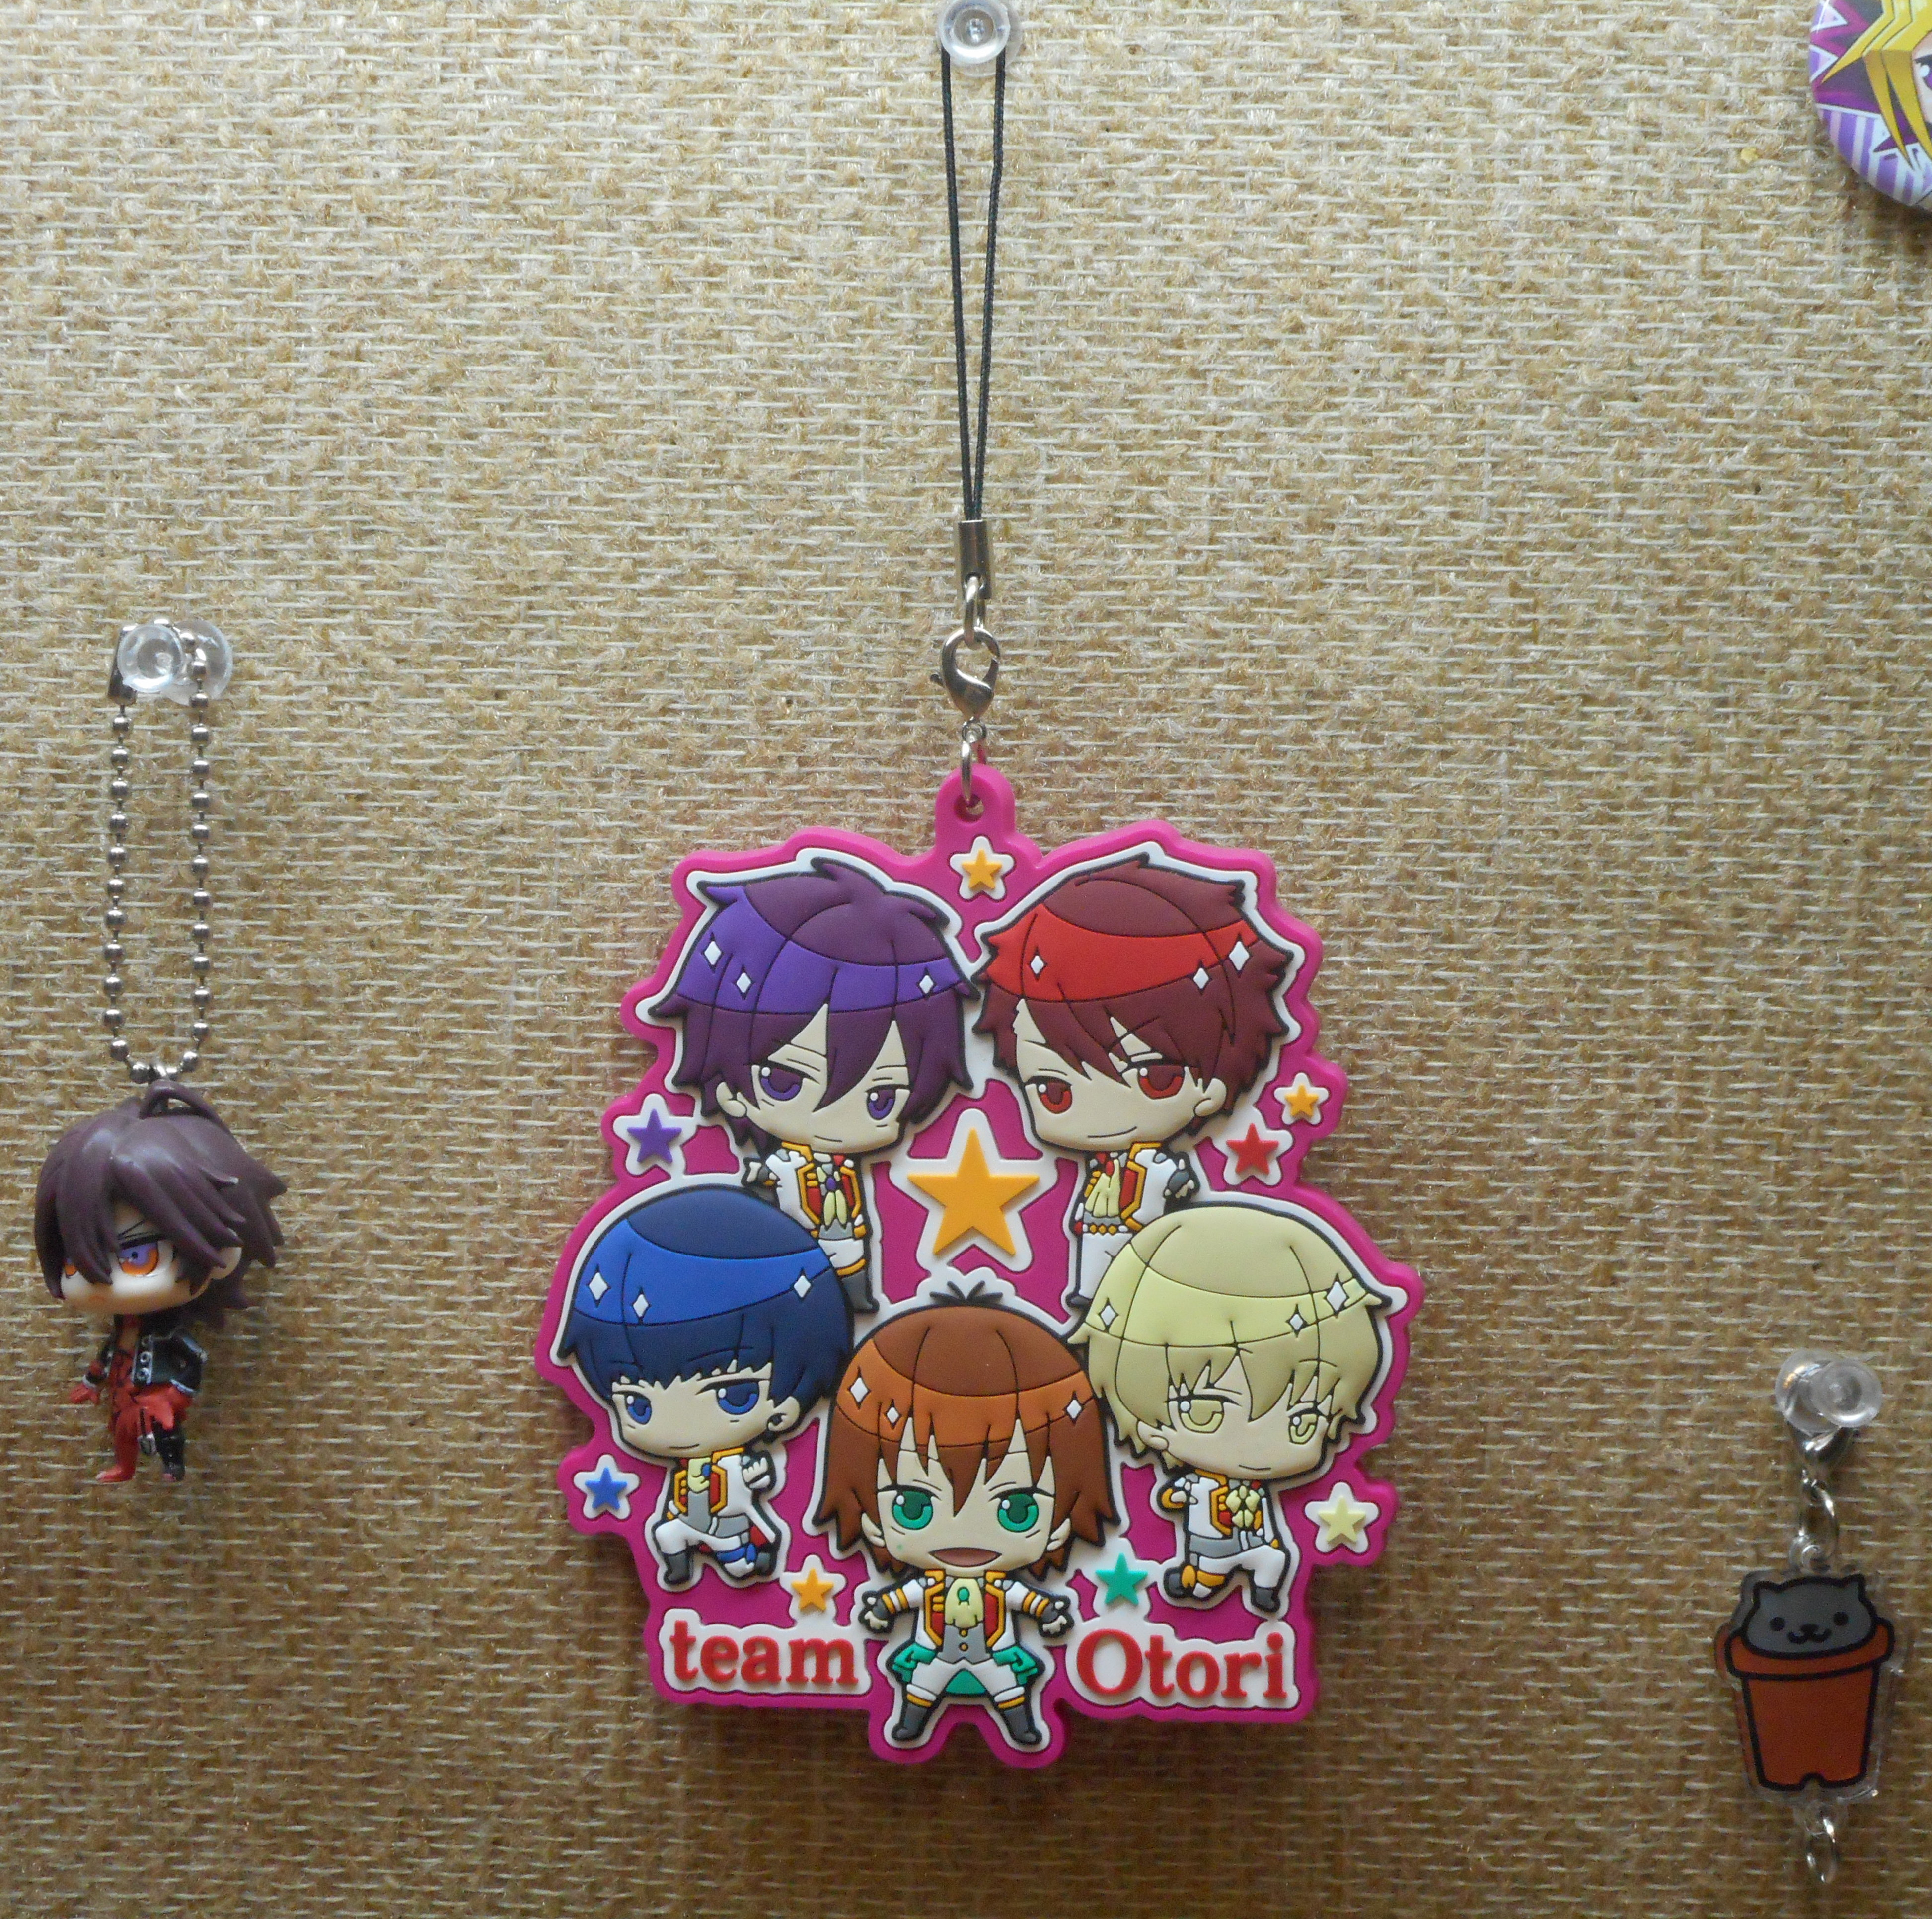 strap shin kadokawa rubber_strap takara_tomy_a.r.t.s amnesia deformed_mini deformed_mini_amnesia acrylic_charm high_school_star_musical neko_atsume joint_acrylic_collection_-joi_colle- neko_atsume_joint_acrylic_collection_part_2 haiiro-san hoshitani_yuuta tooru_nayuki tsukigami_kaito tengenji_kakeru i0plus kuga_shuu